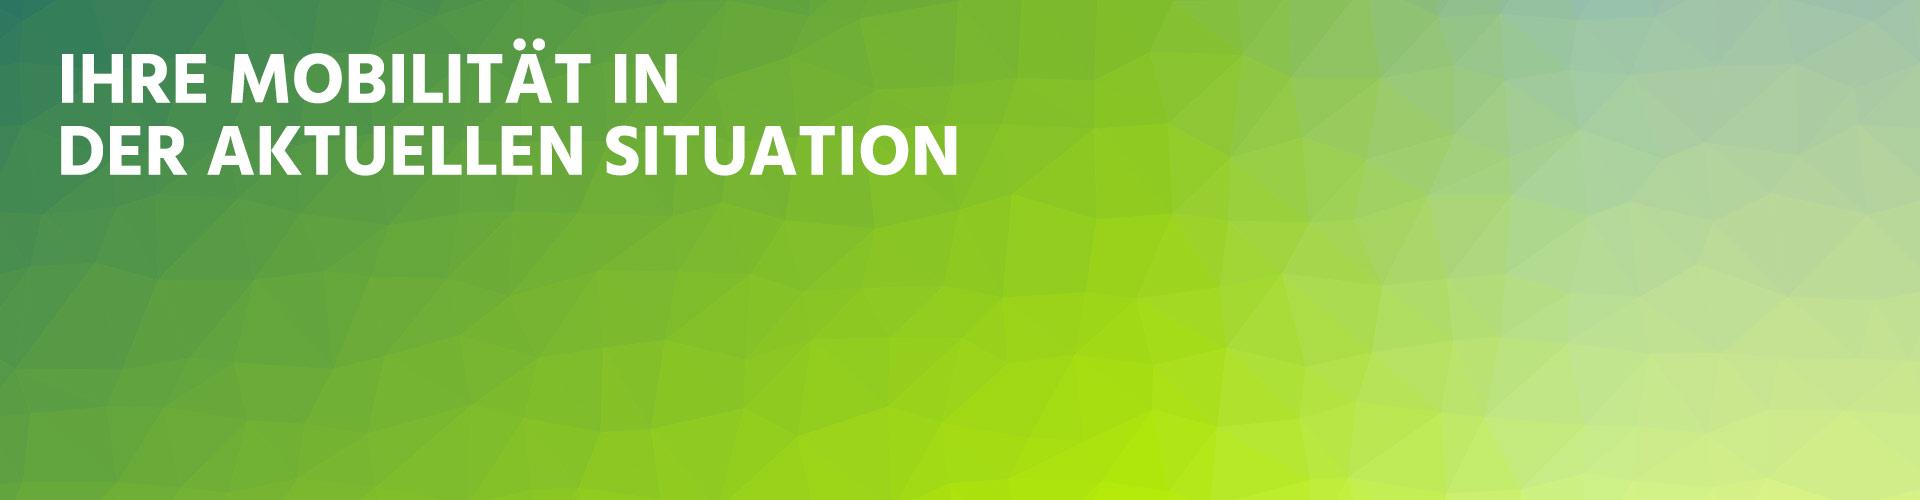 Informationen zum Umgang mit COVID-19